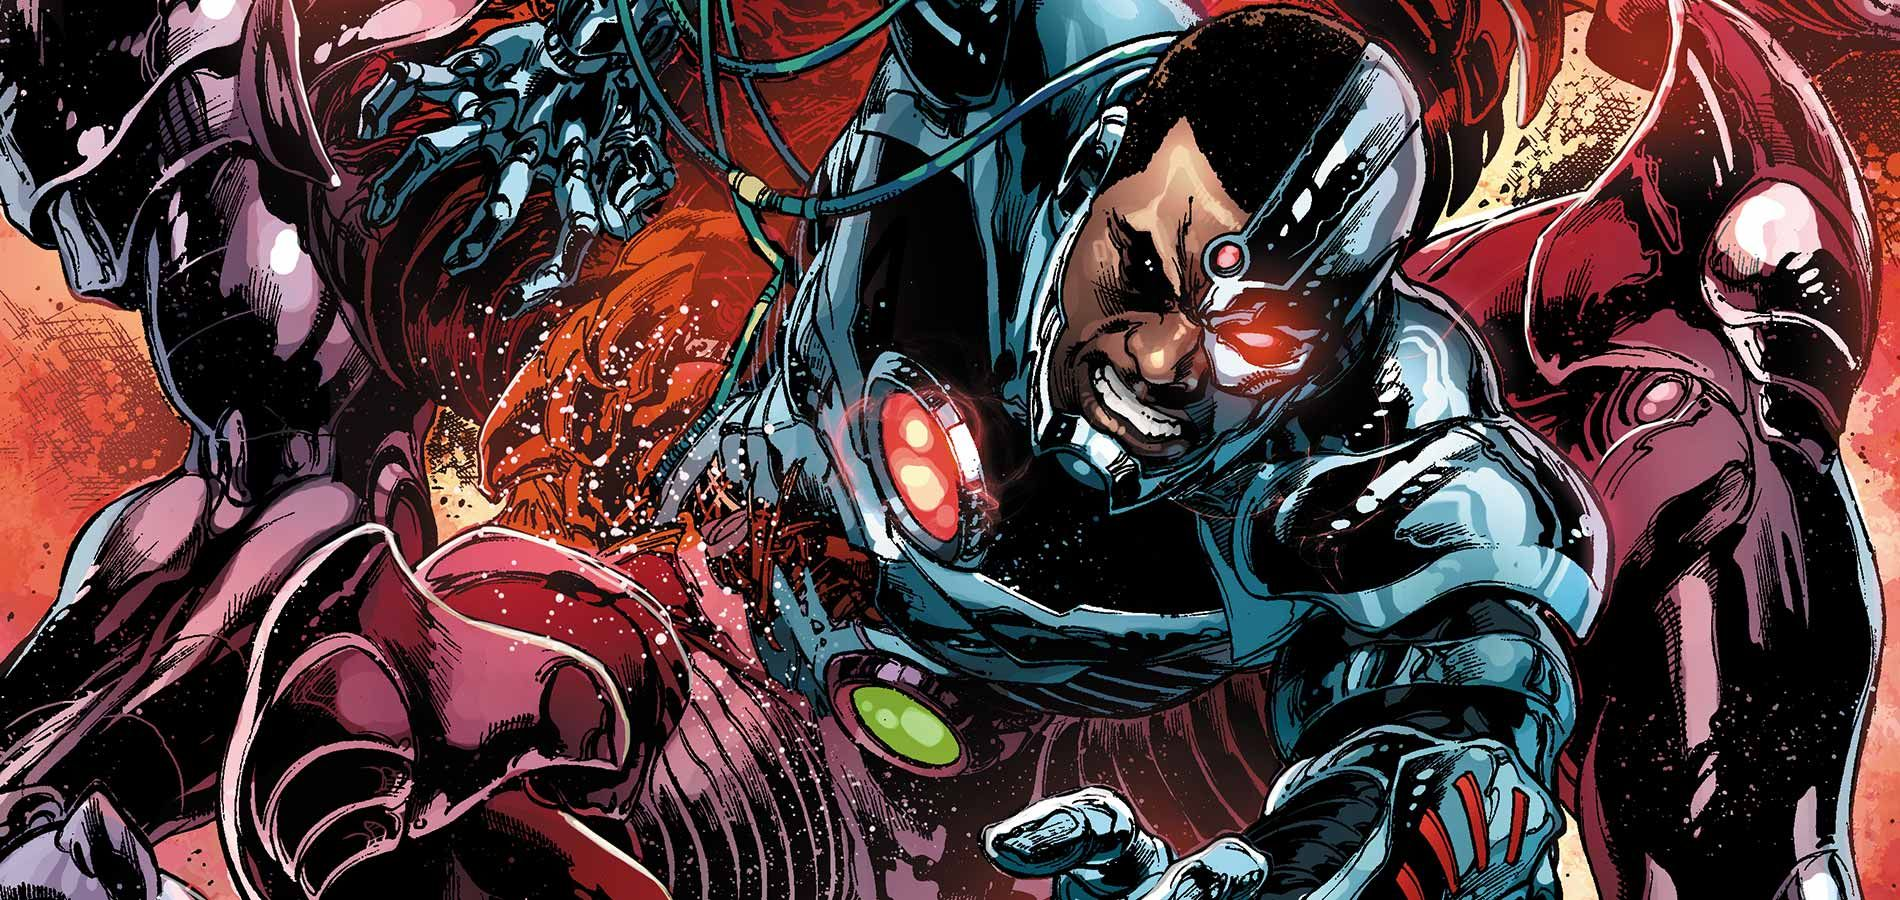 Image result for cyborg comics evil